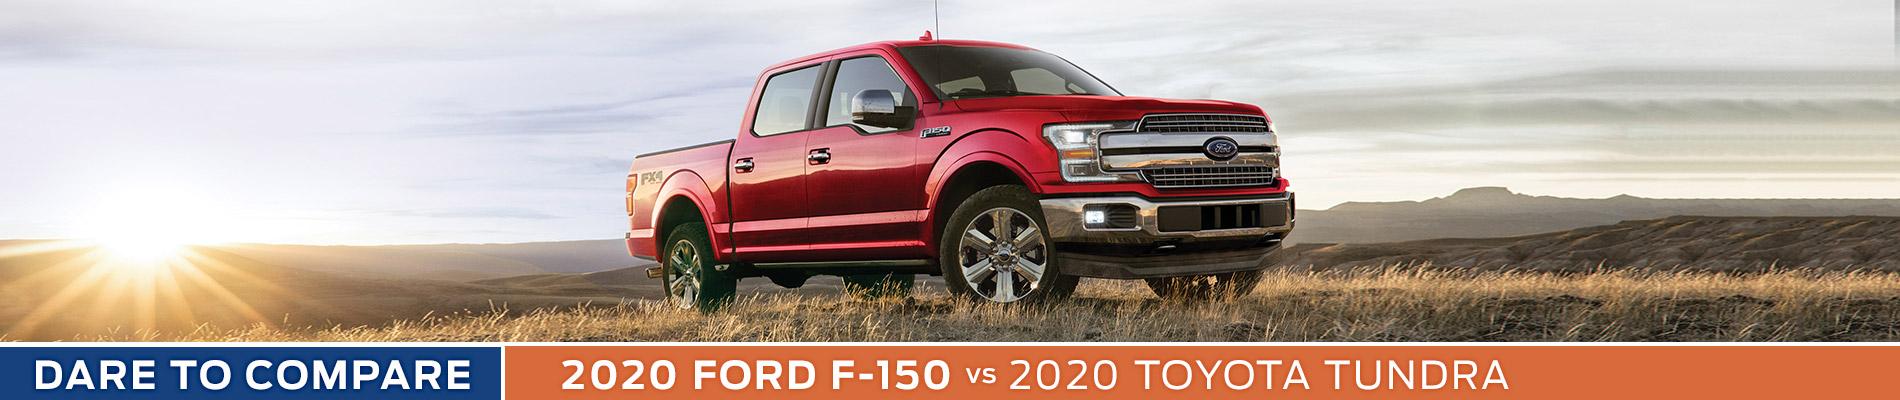 2020 Ford F-150 vs Toyota Tundra - Sun State Ford - Orlando, FL